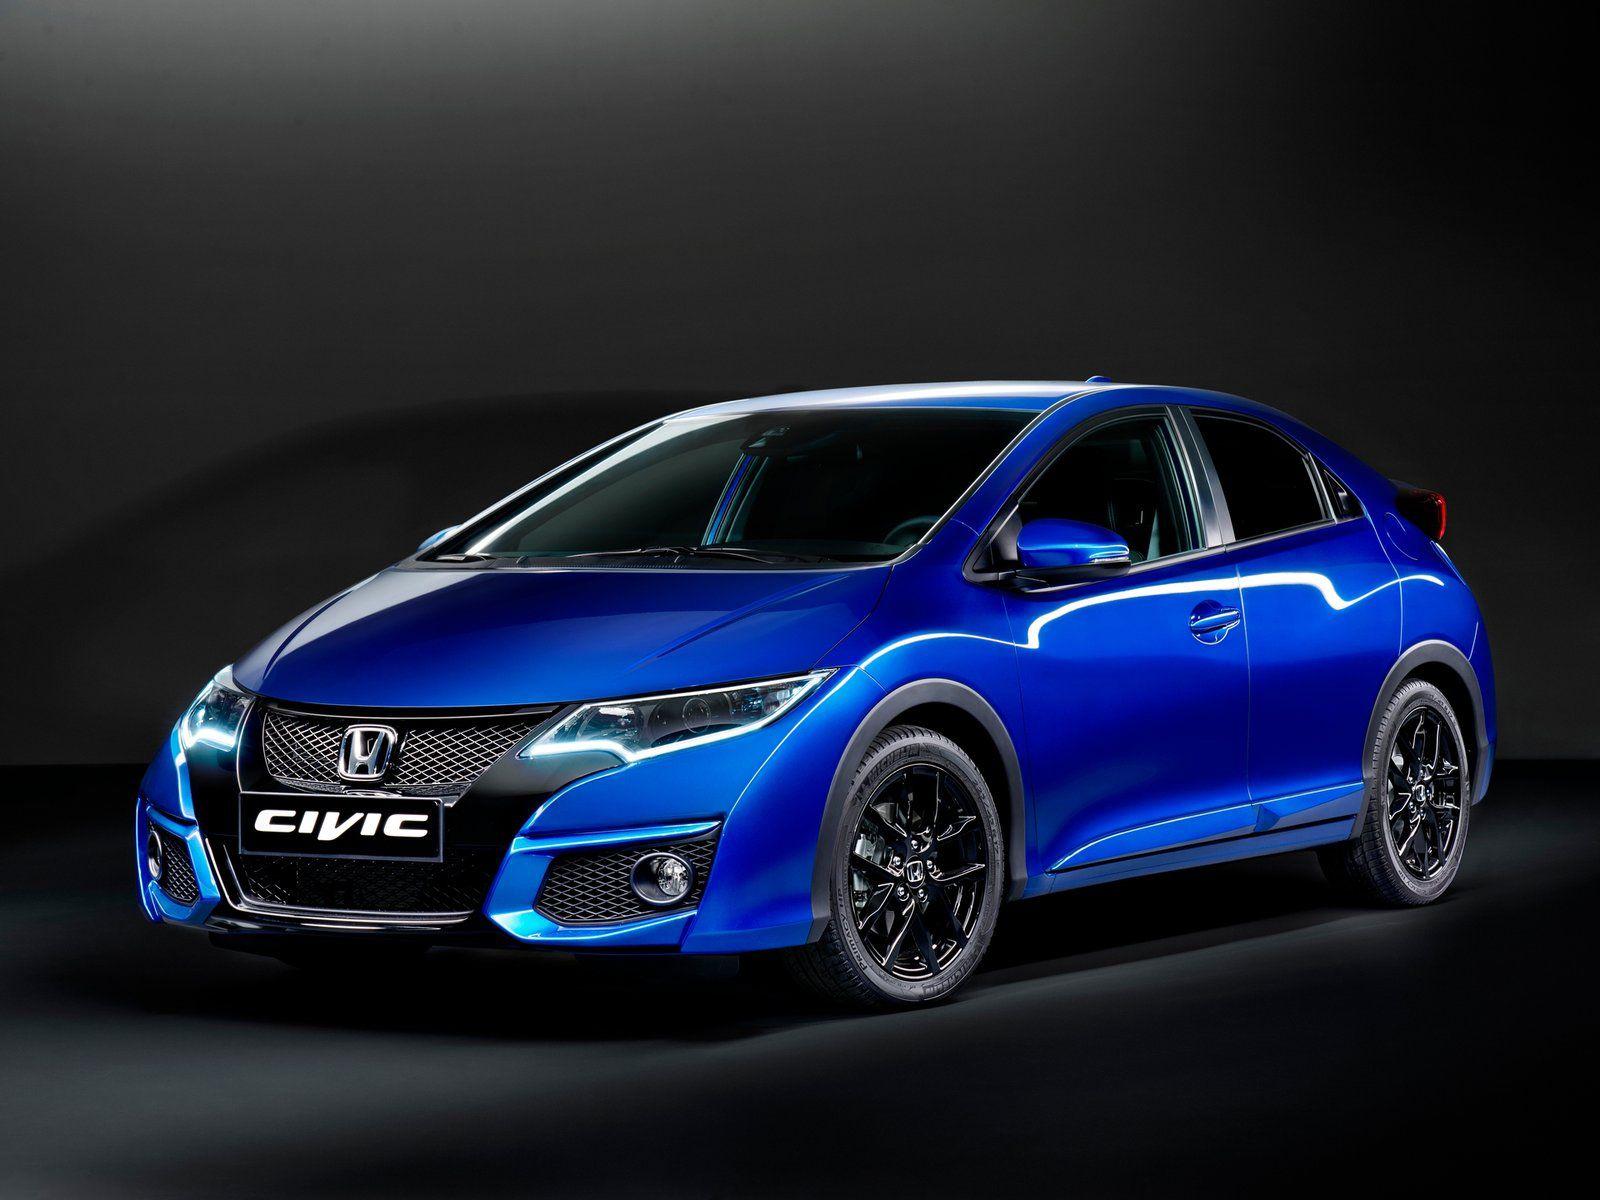 Honda Civic Sport 2015 Hd Images And Photos